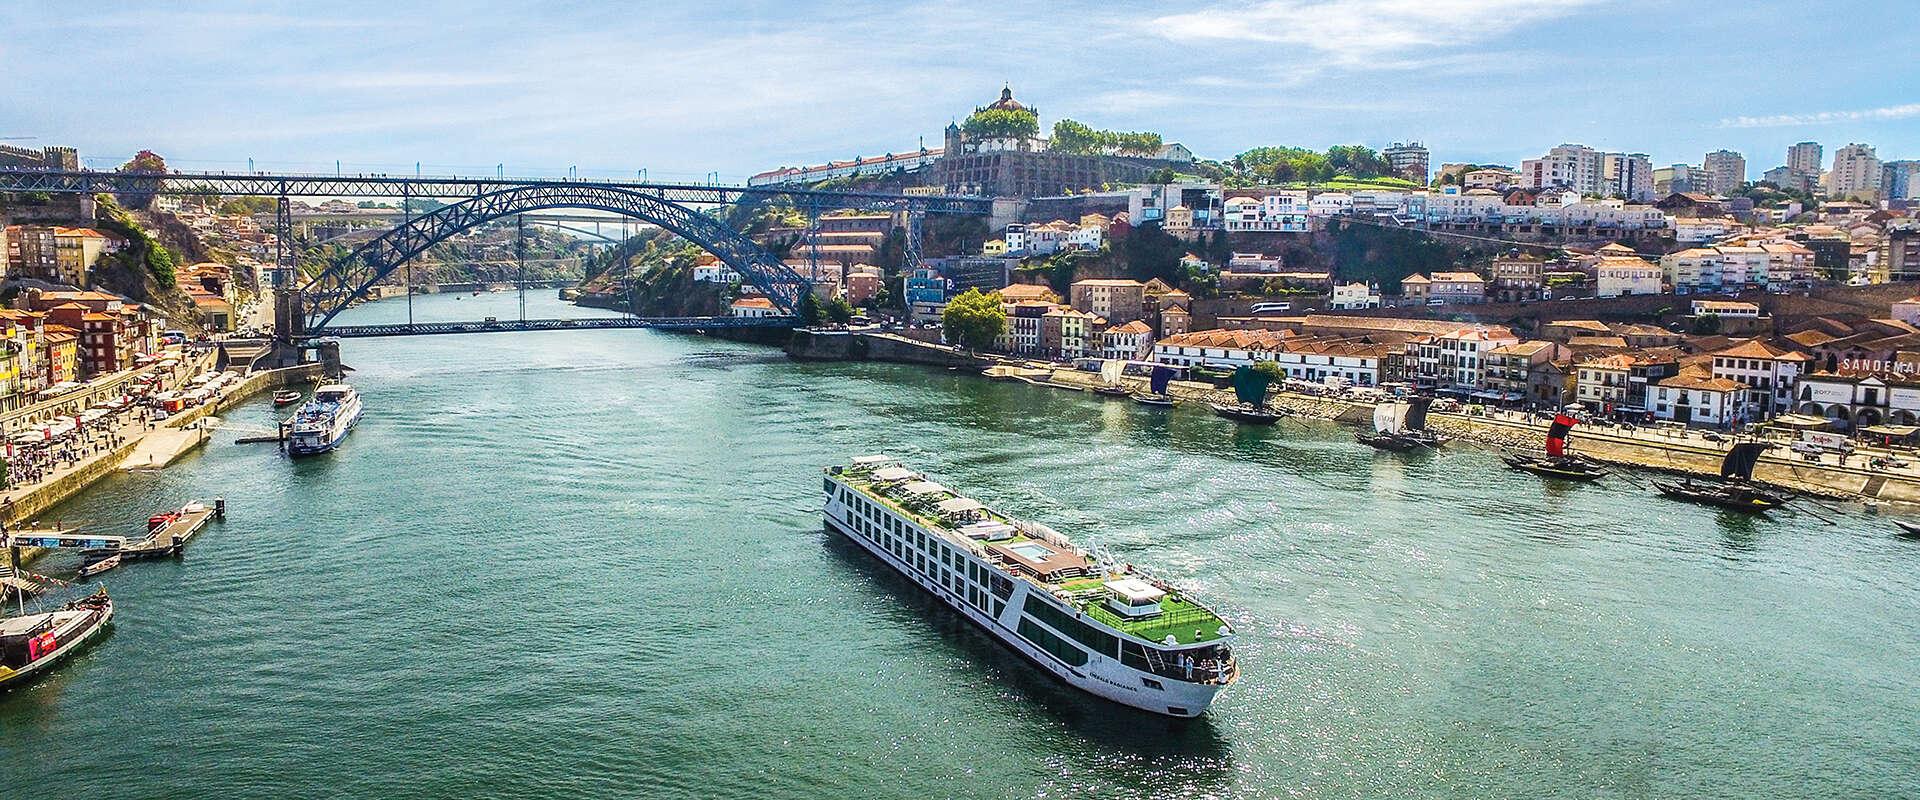 Portugal's River of Gold November 2022